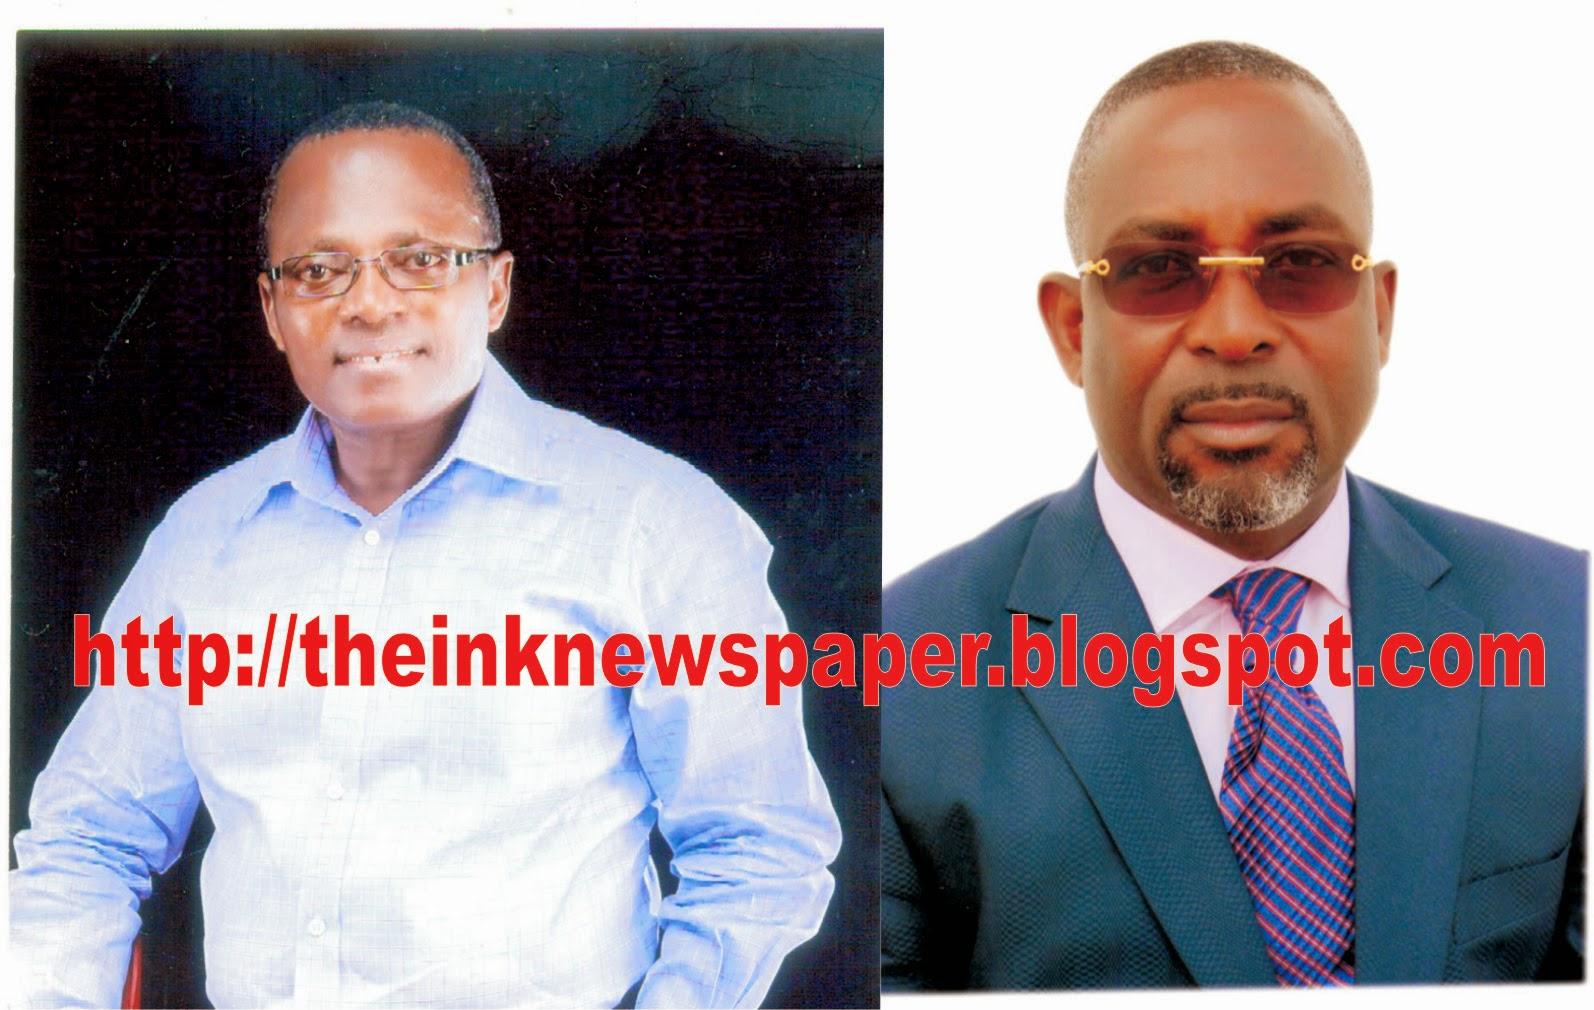 Commissioner Ekpuk Udom felicitates Barr. Enoidem on his birthday